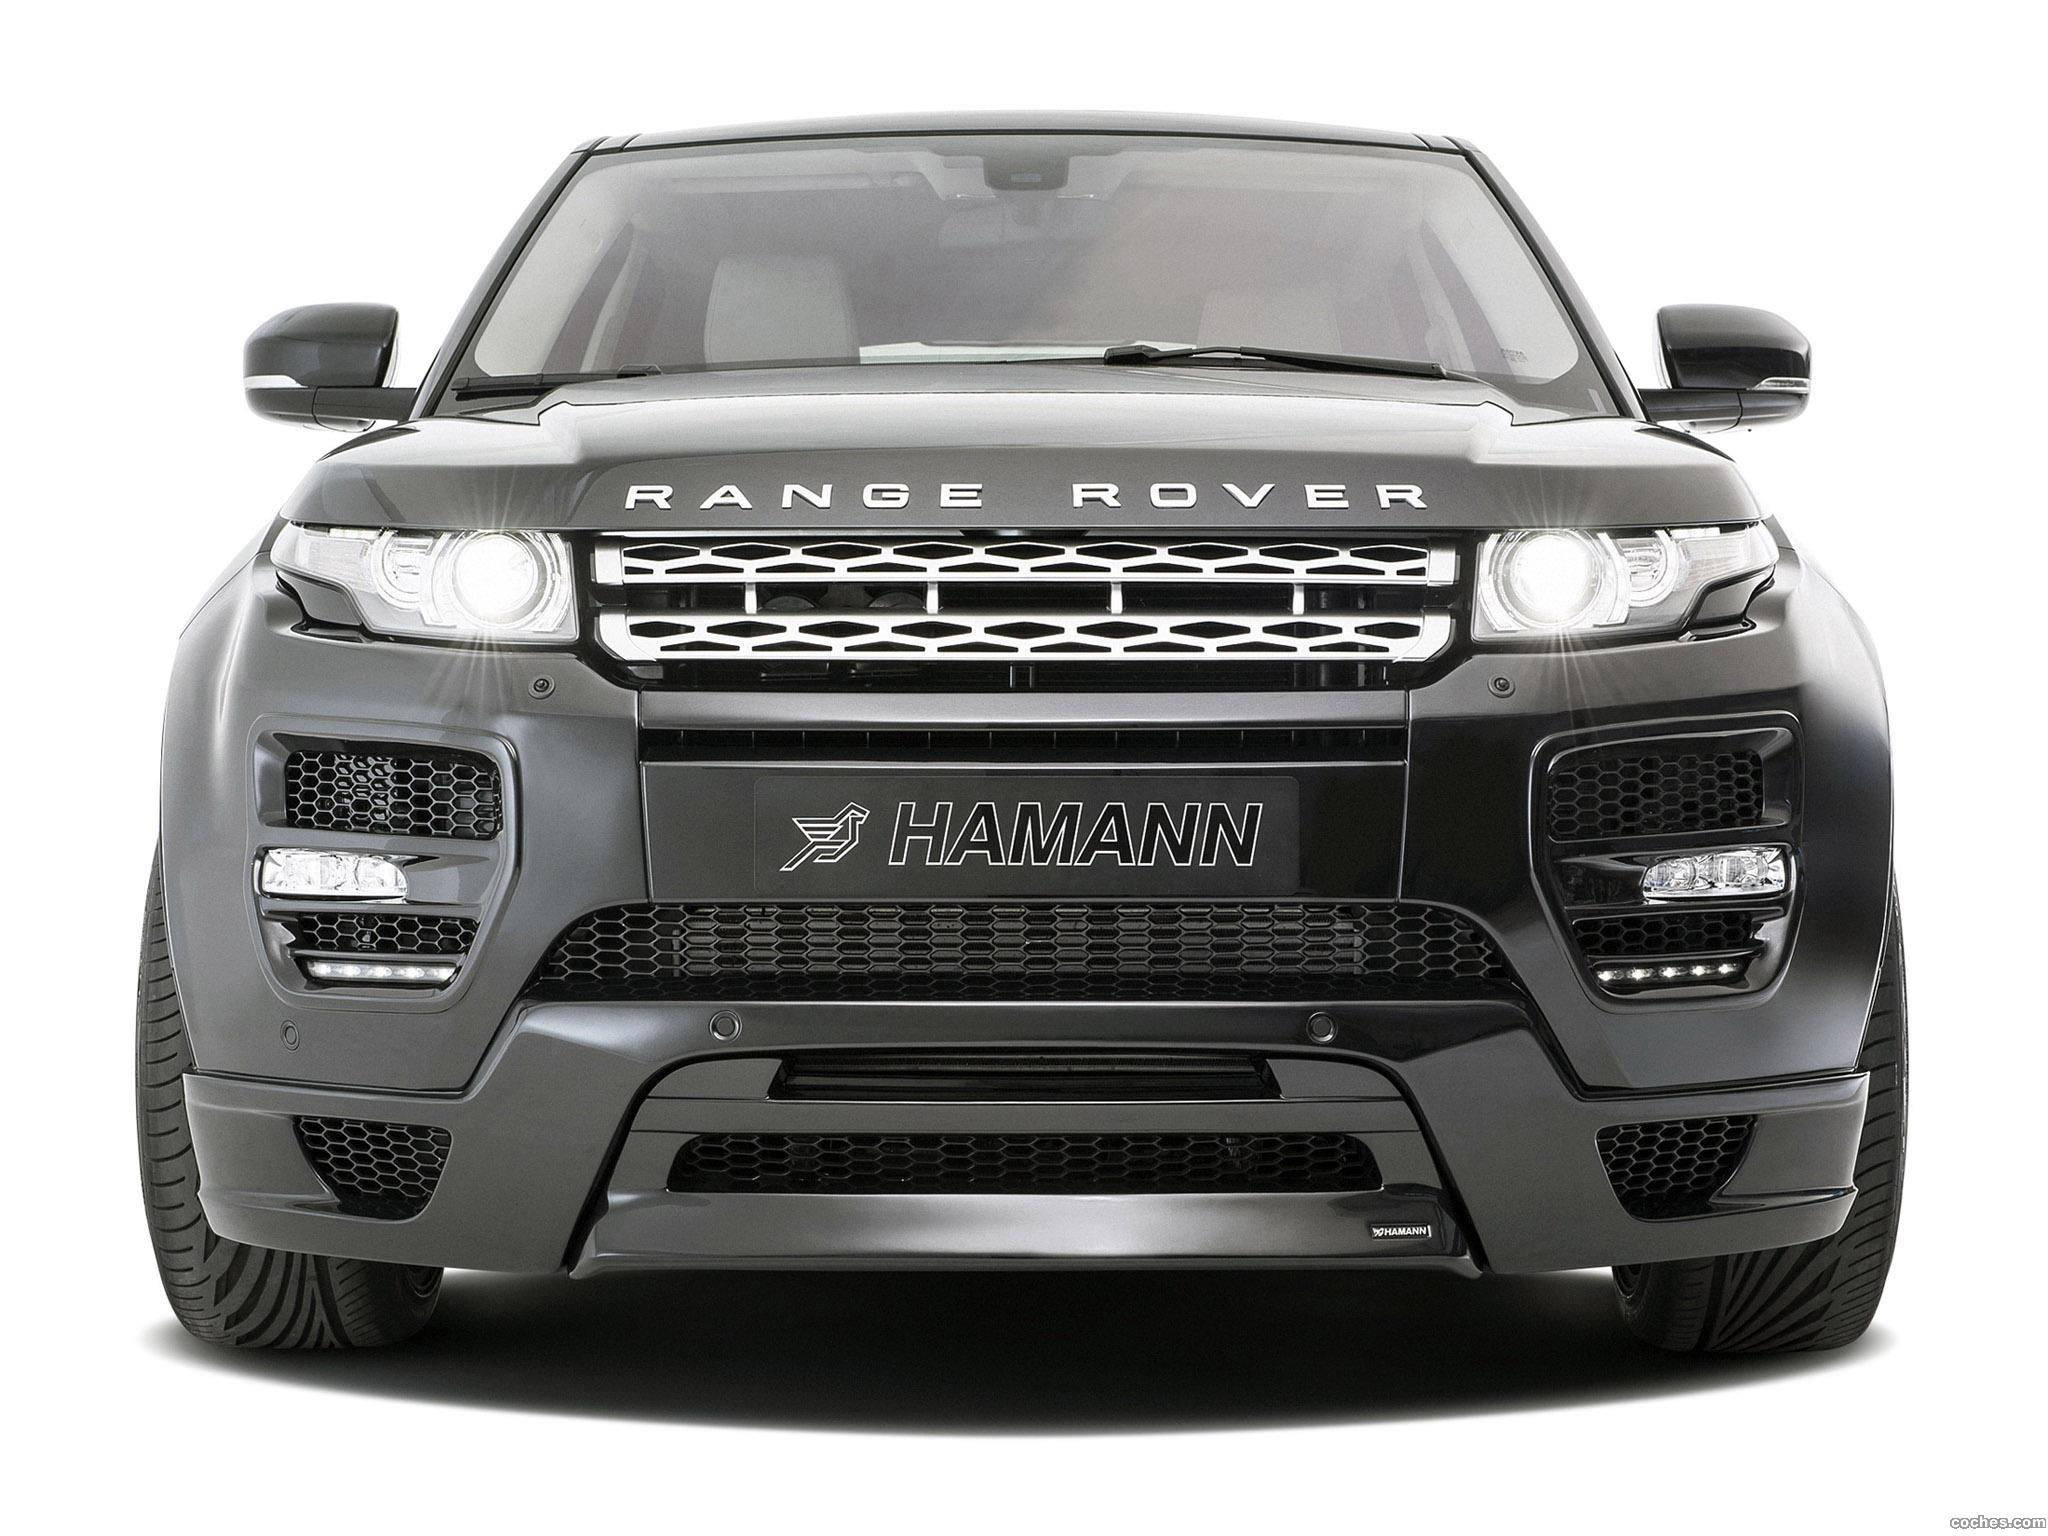 hamann_range-rover-evoque-si4-2012_r7